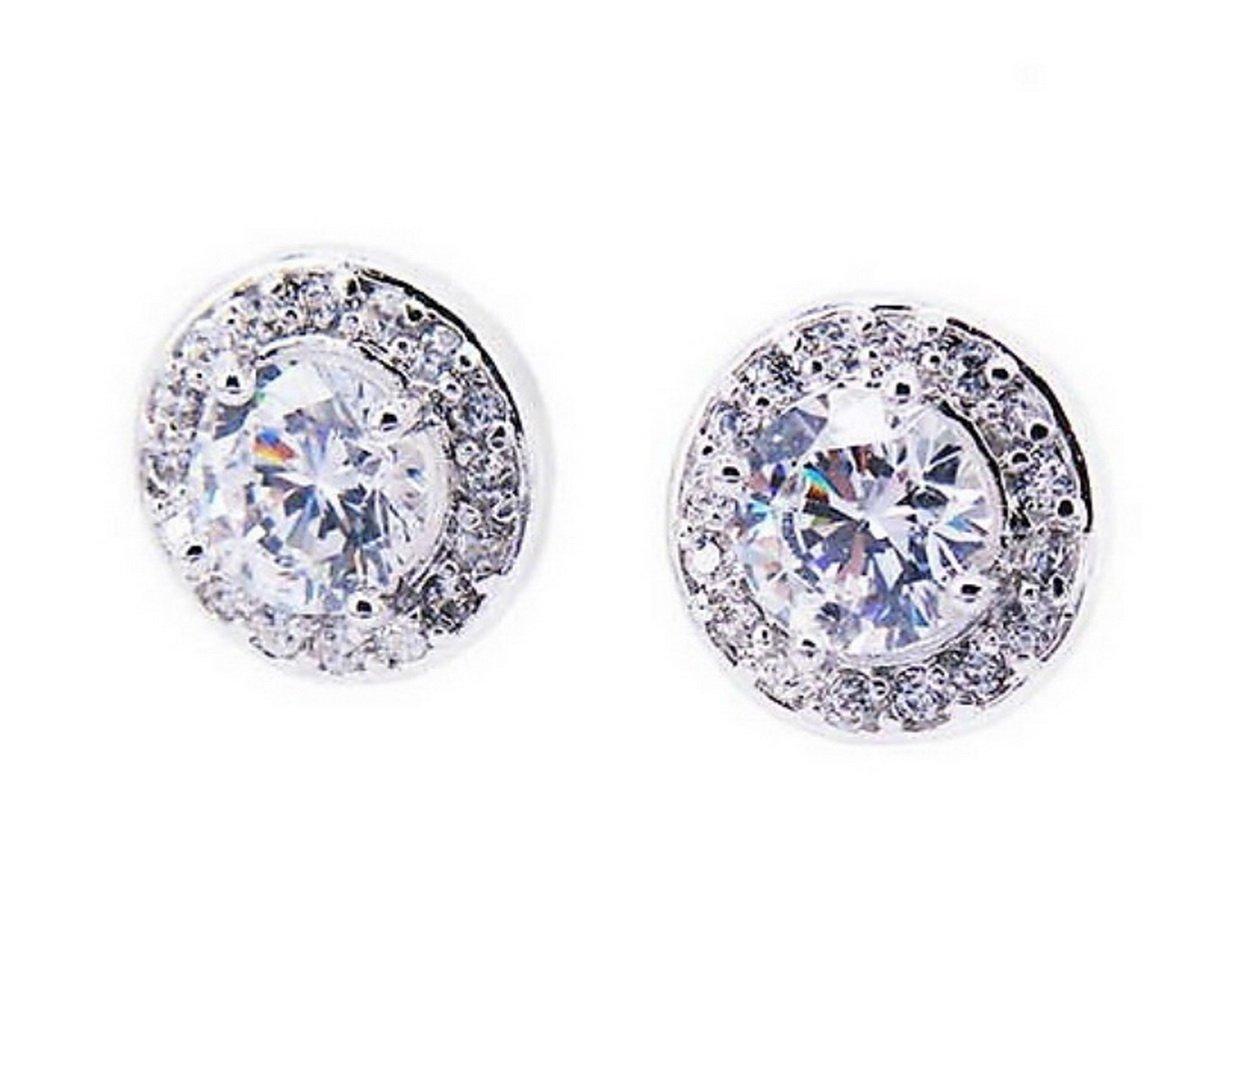 bde2f8689316 Amazon.com  Swarovski 925 Sterling Silver Stud Halo Earrings Women CZ  Diamonds Cubic Zirconia Celeste Solitaire Round Cut 1 CT Surrounded with  Swarovski ...